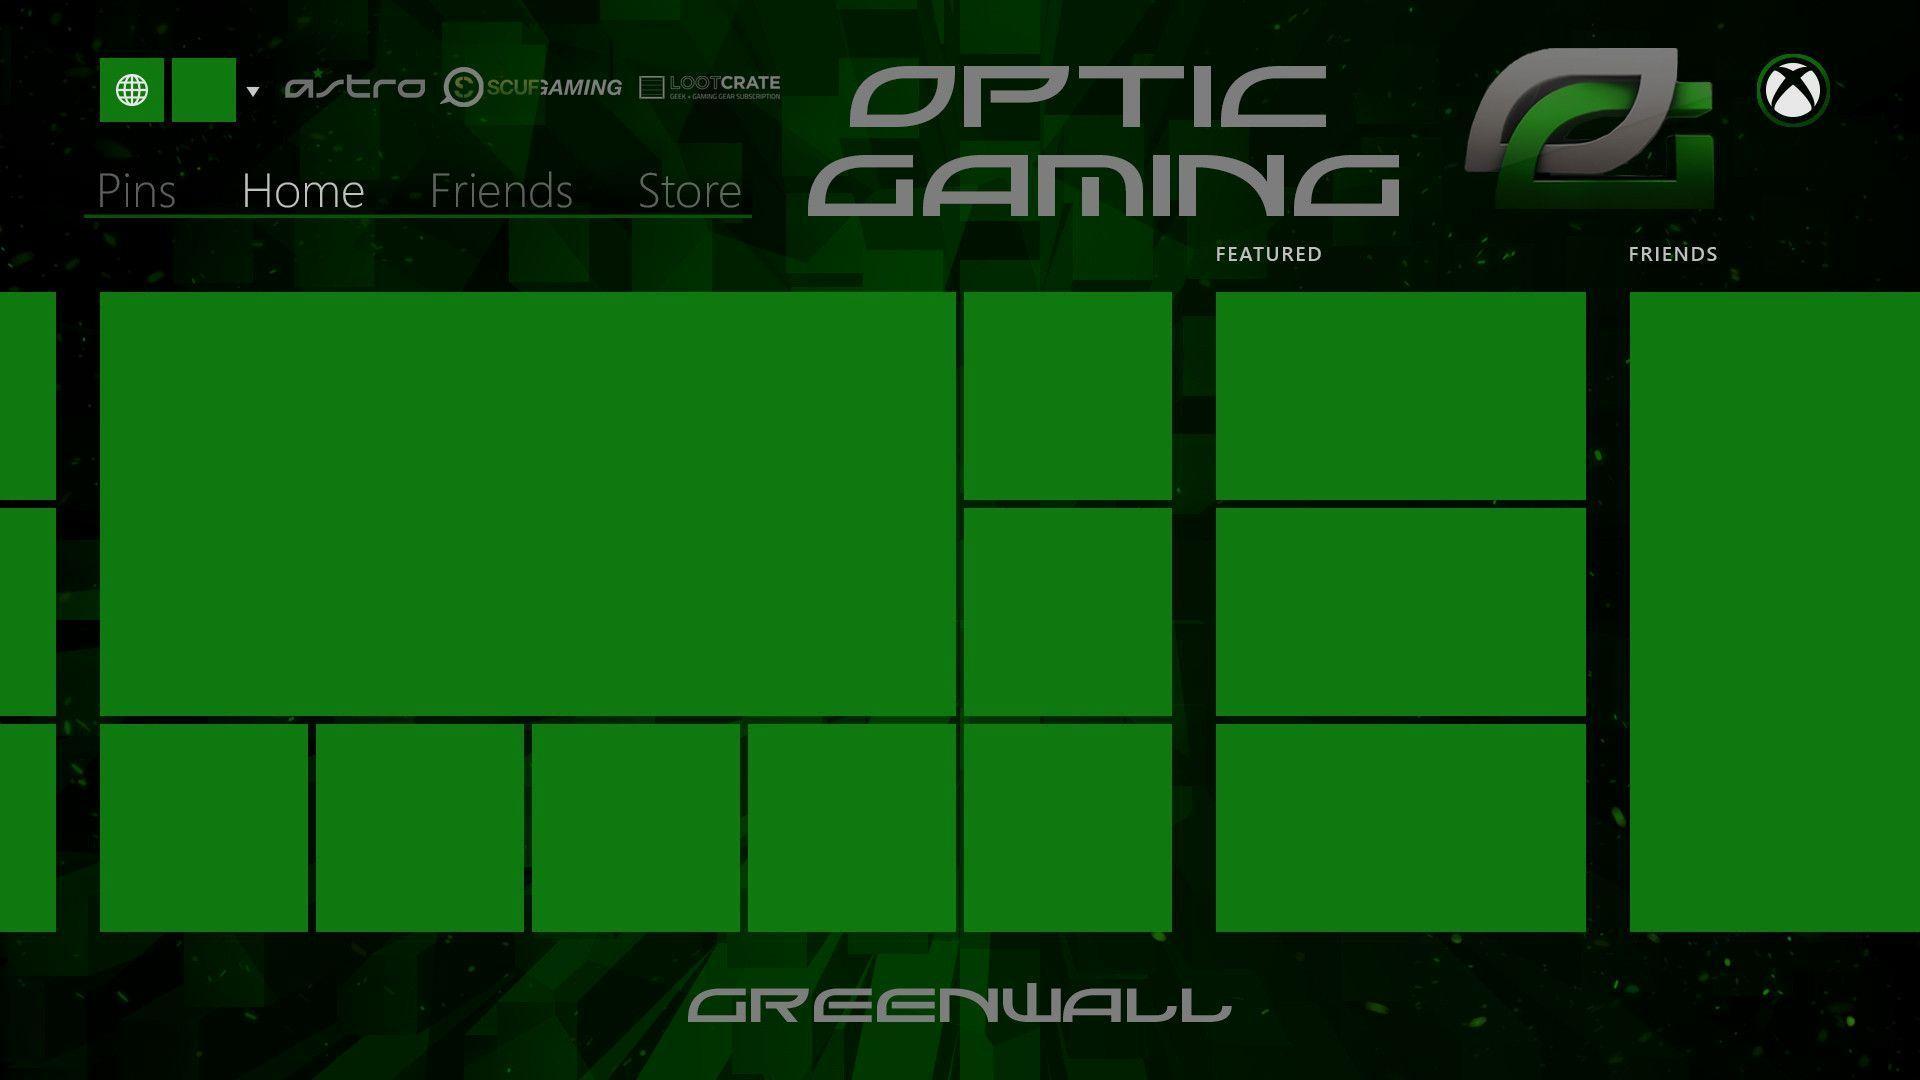 Optic-gaming-background